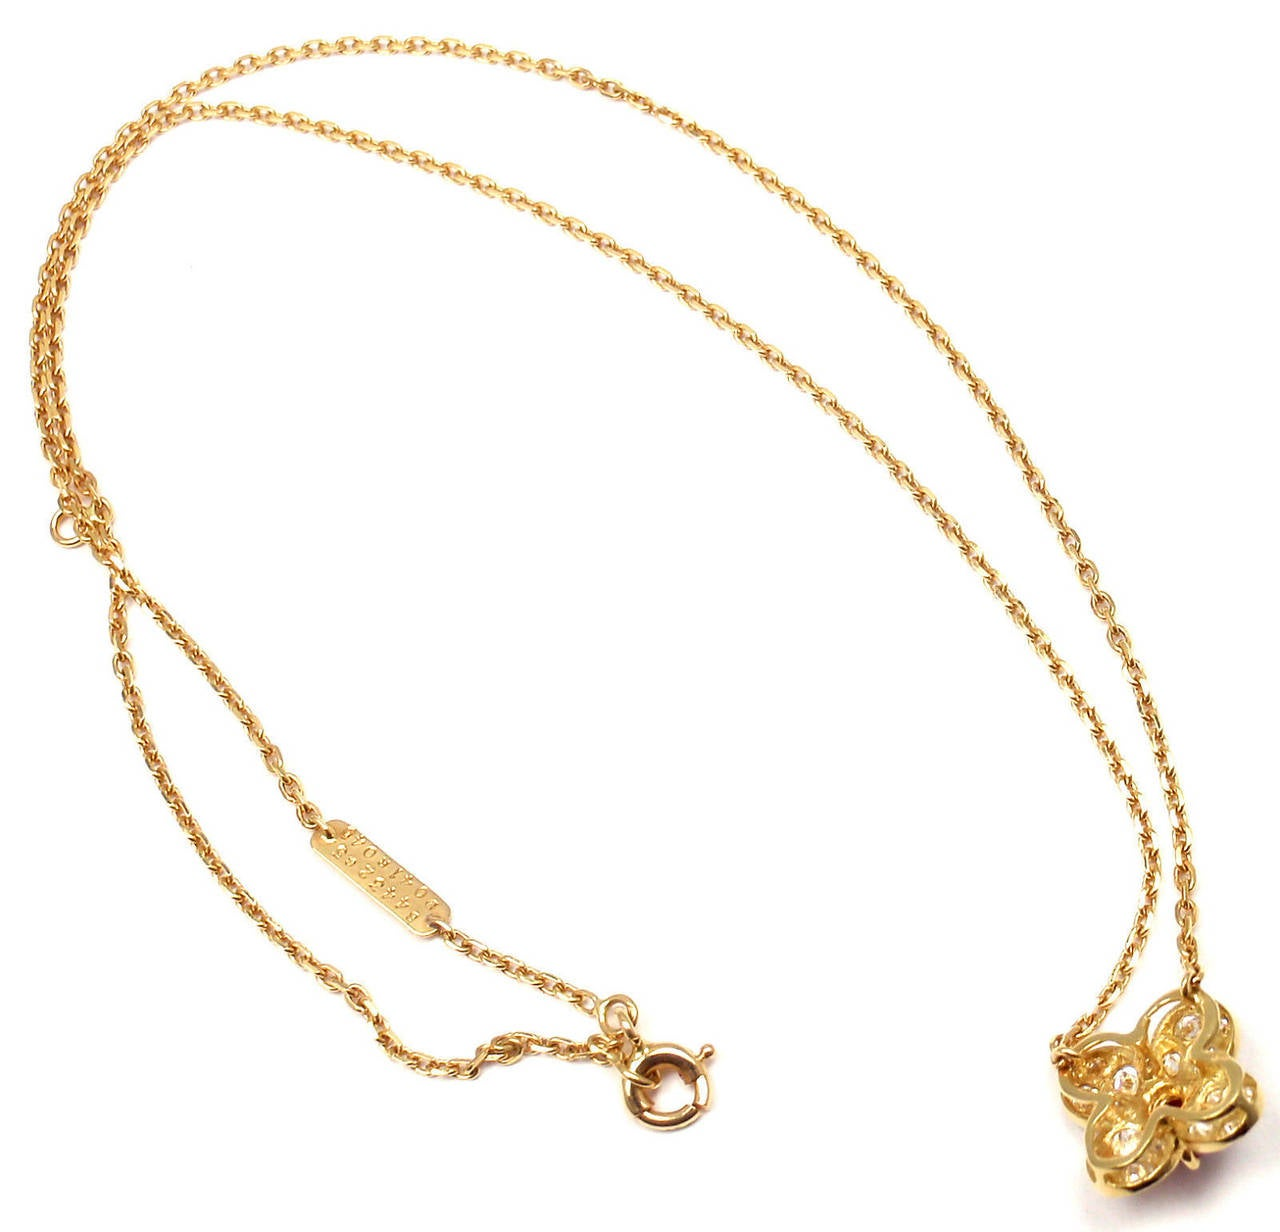 Clover Necklace Van Cleef: Van Cleef And Arpels Trefle Alhambra Diamond Ruby Clover